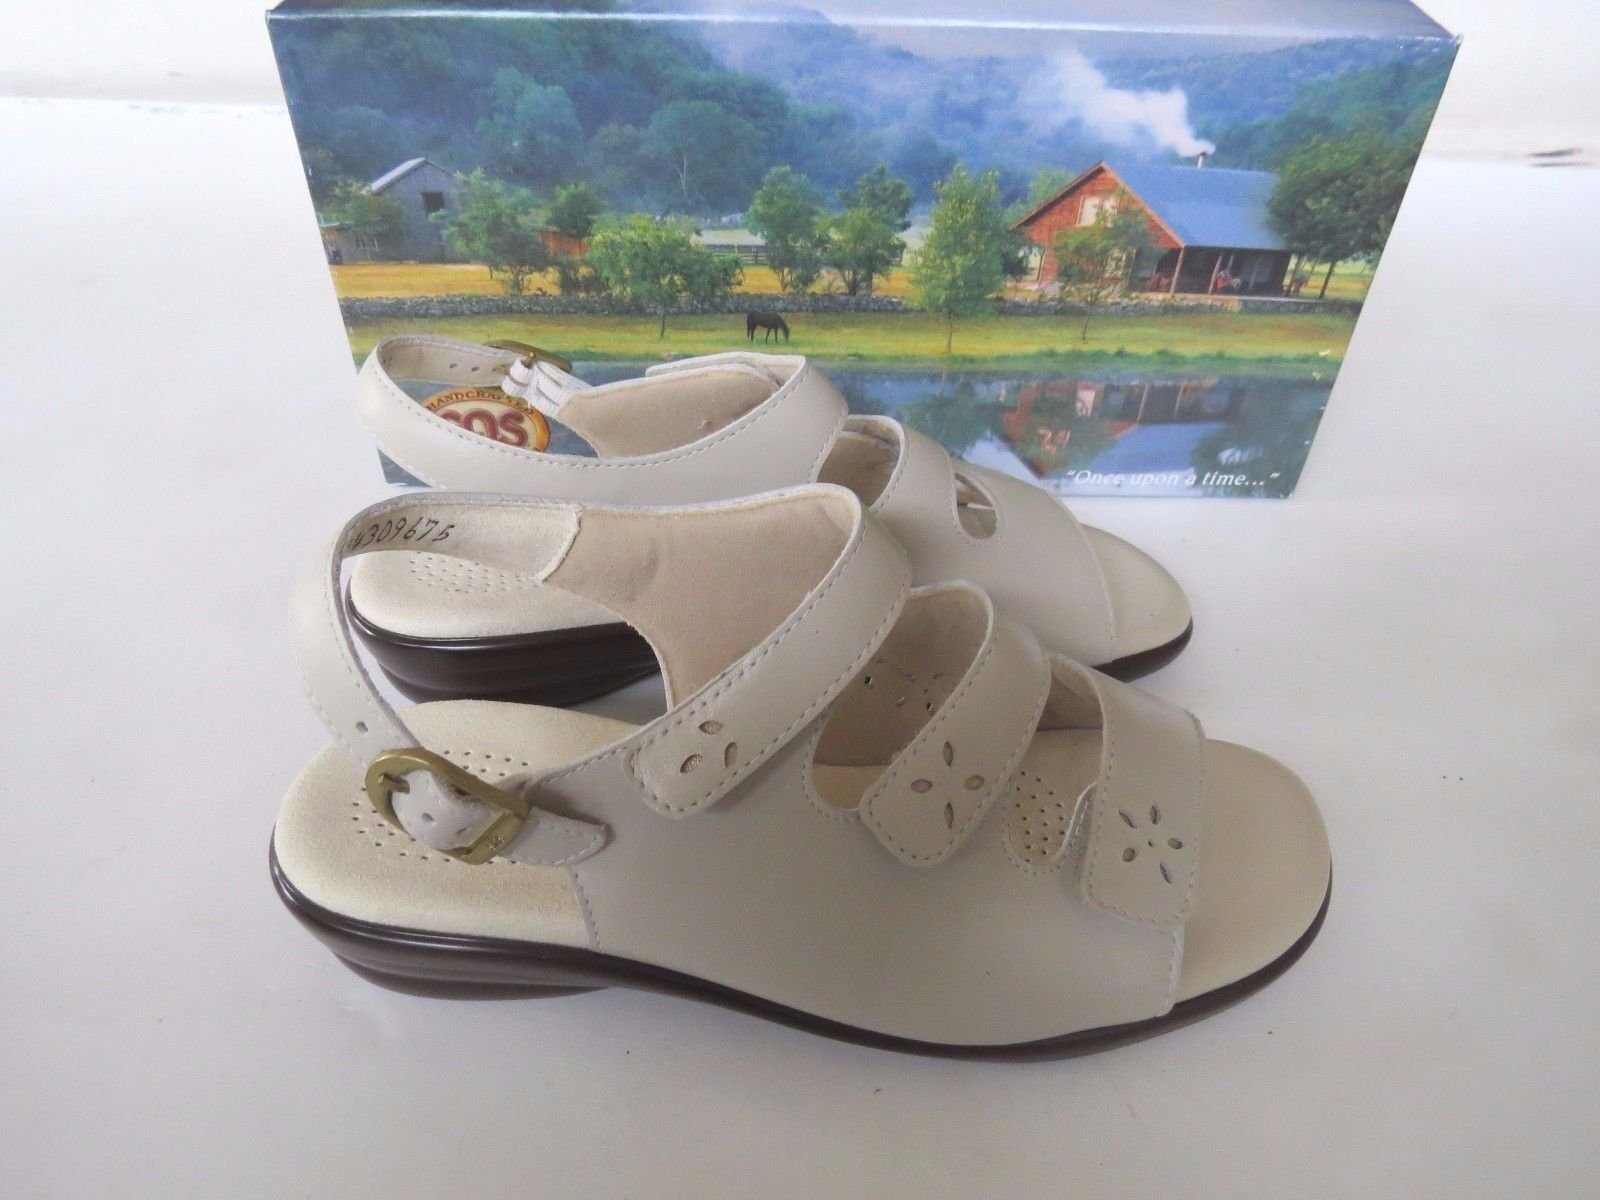 SAS  adjustable slip on ankle strap sandals shoes Bone Quatro USA comfort 6.5 W